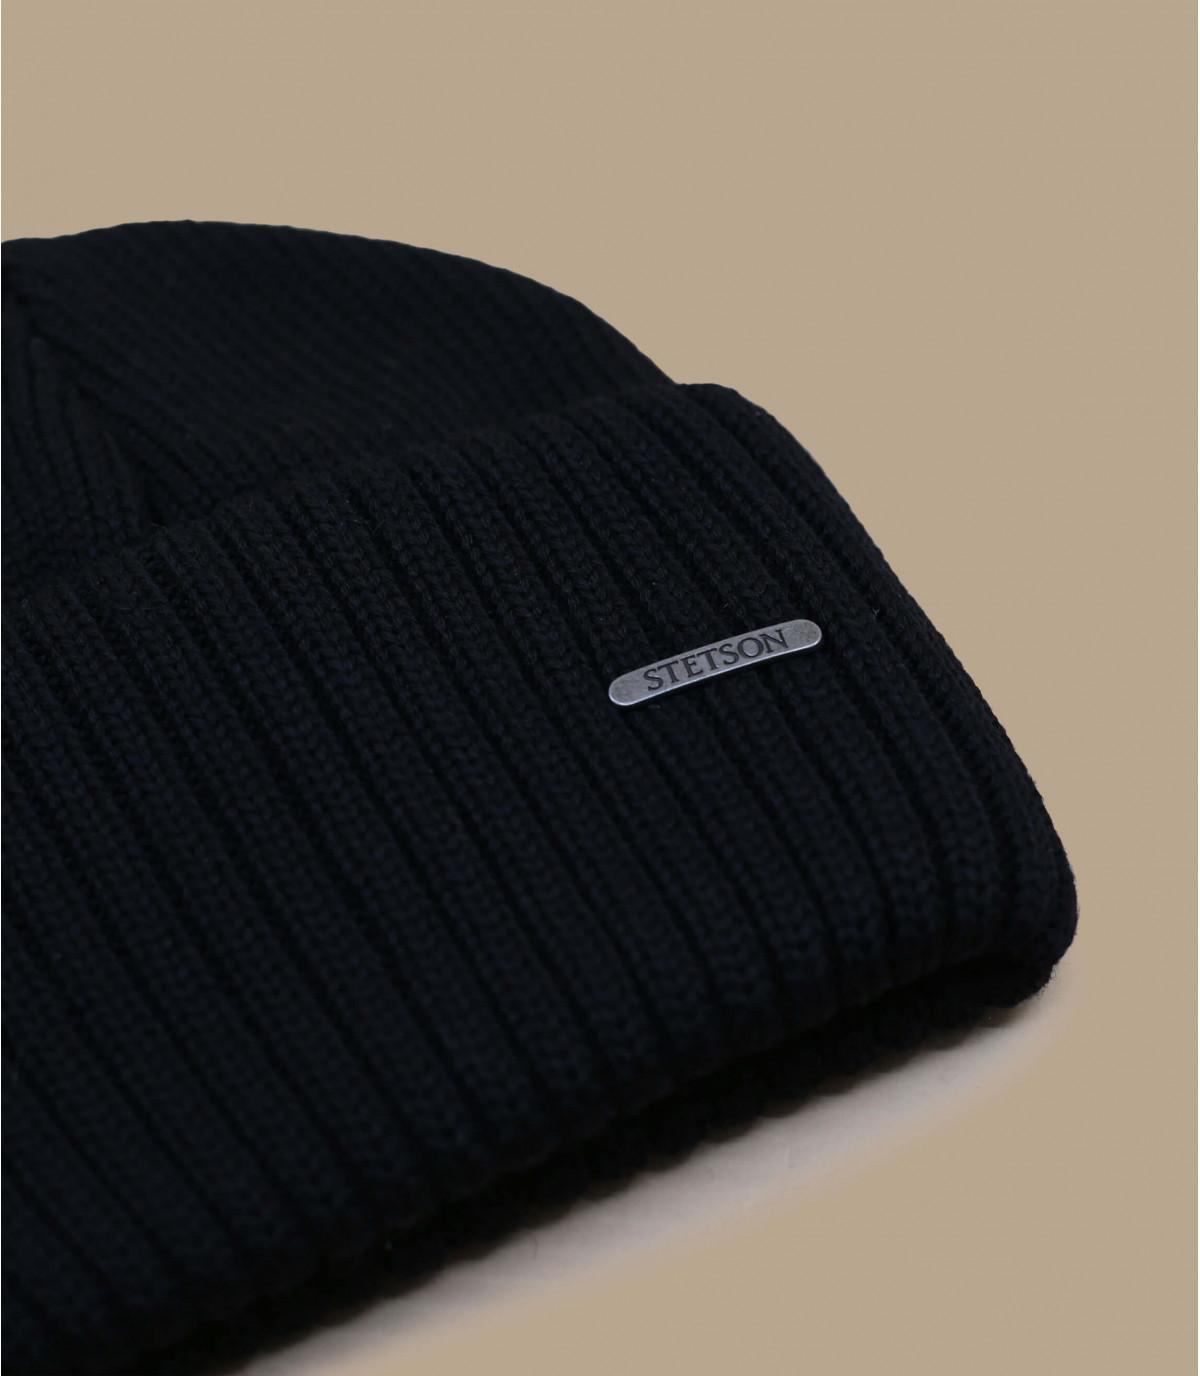 3c371b1a5501c Black beanie stetson - Northport black by Stetson.